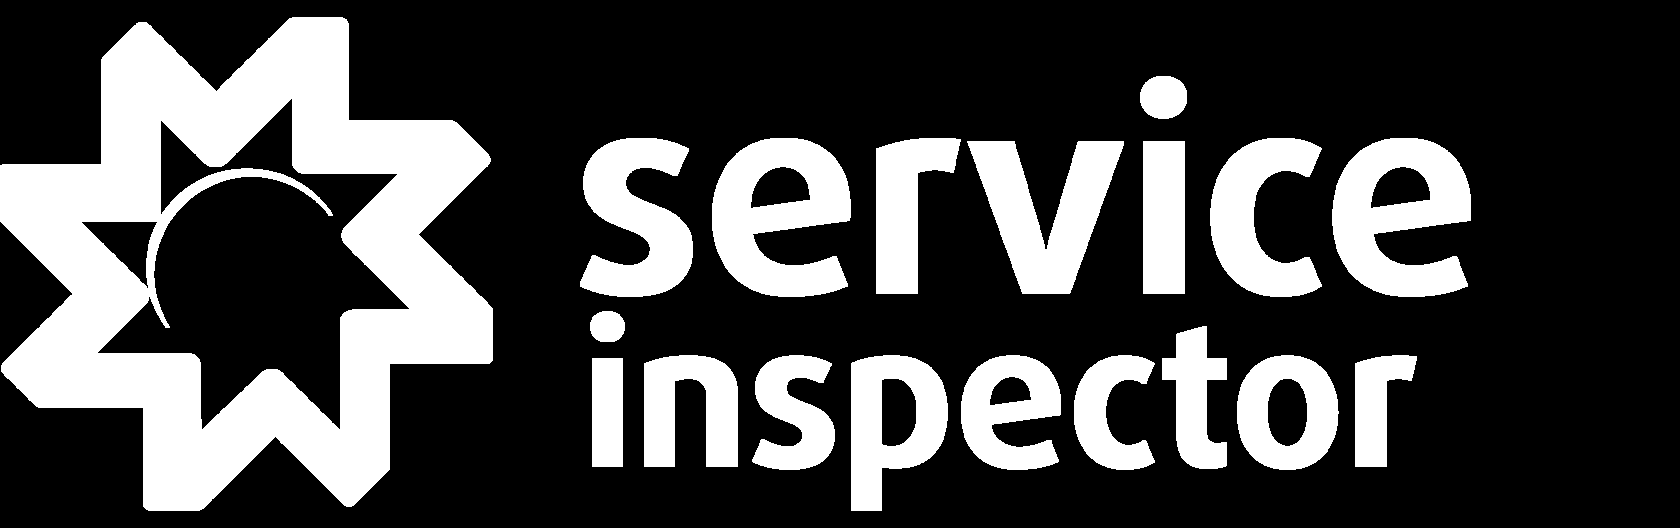 Service Inspector